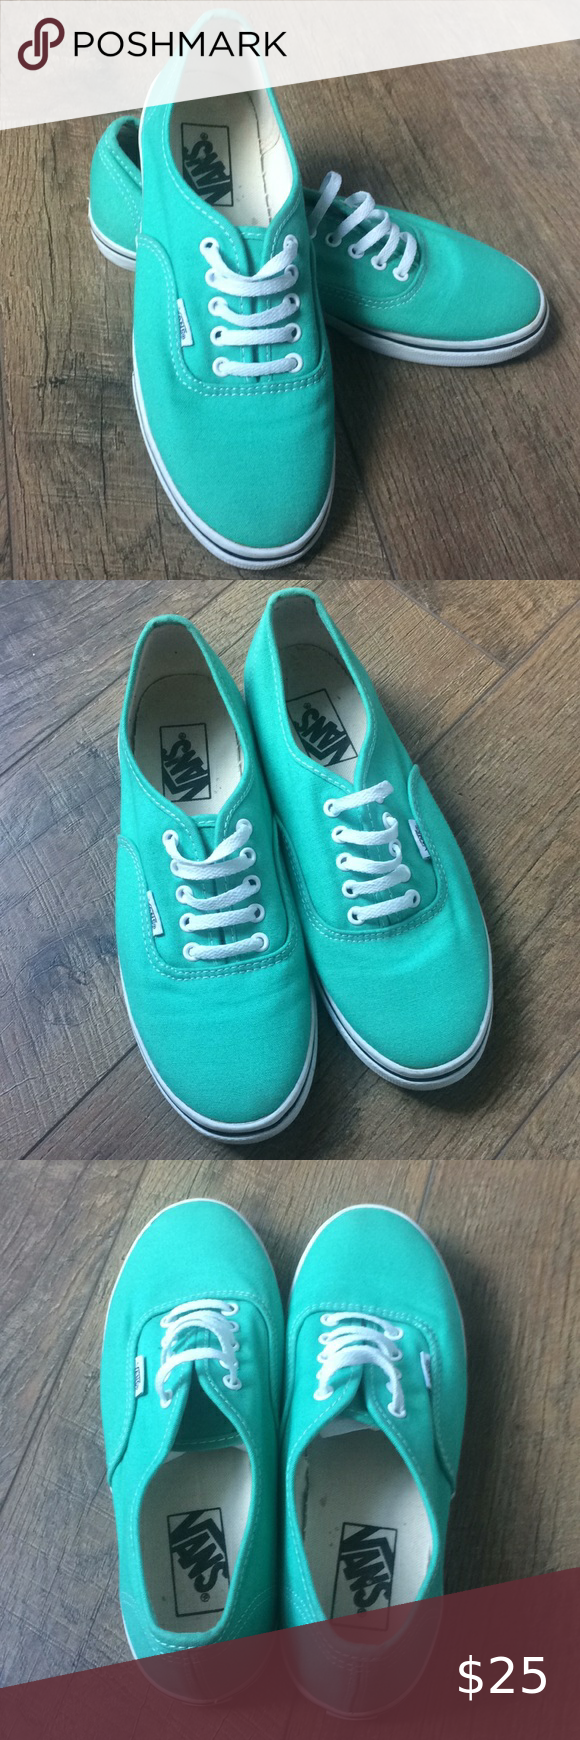 Vans aqua/teal low-top shoes sneakers